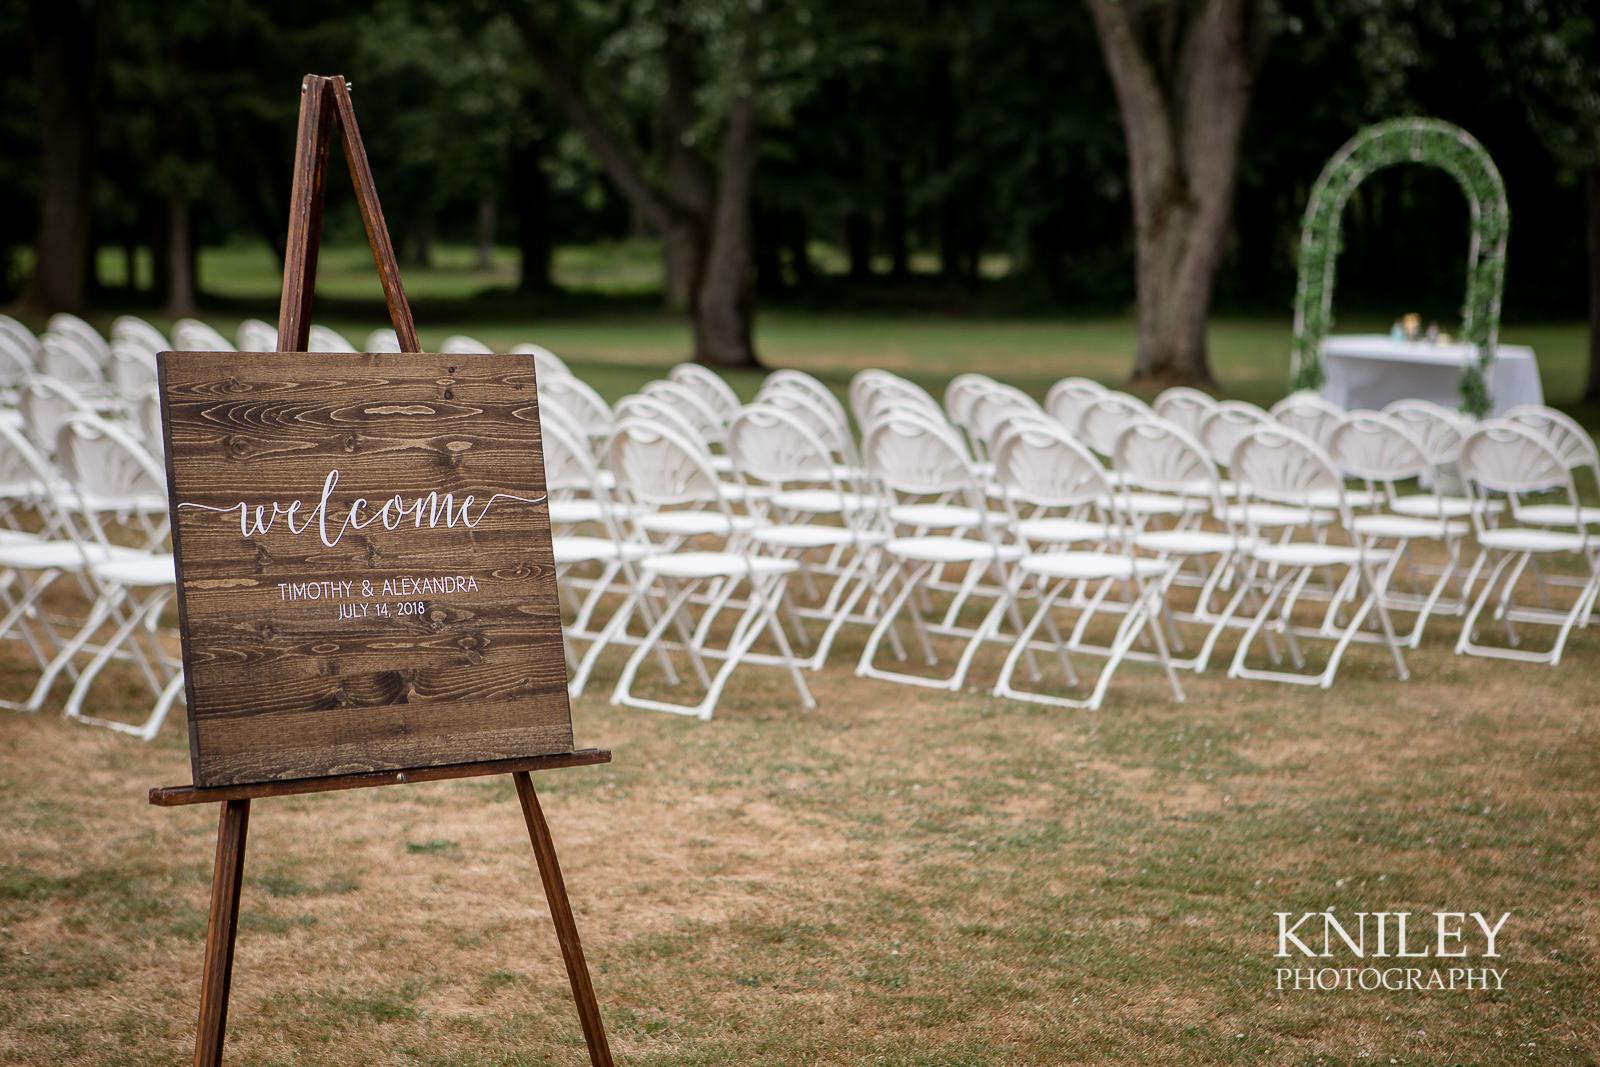 032 - Ontario Golf Club Wedding Pictures - IMG_7620.jpg